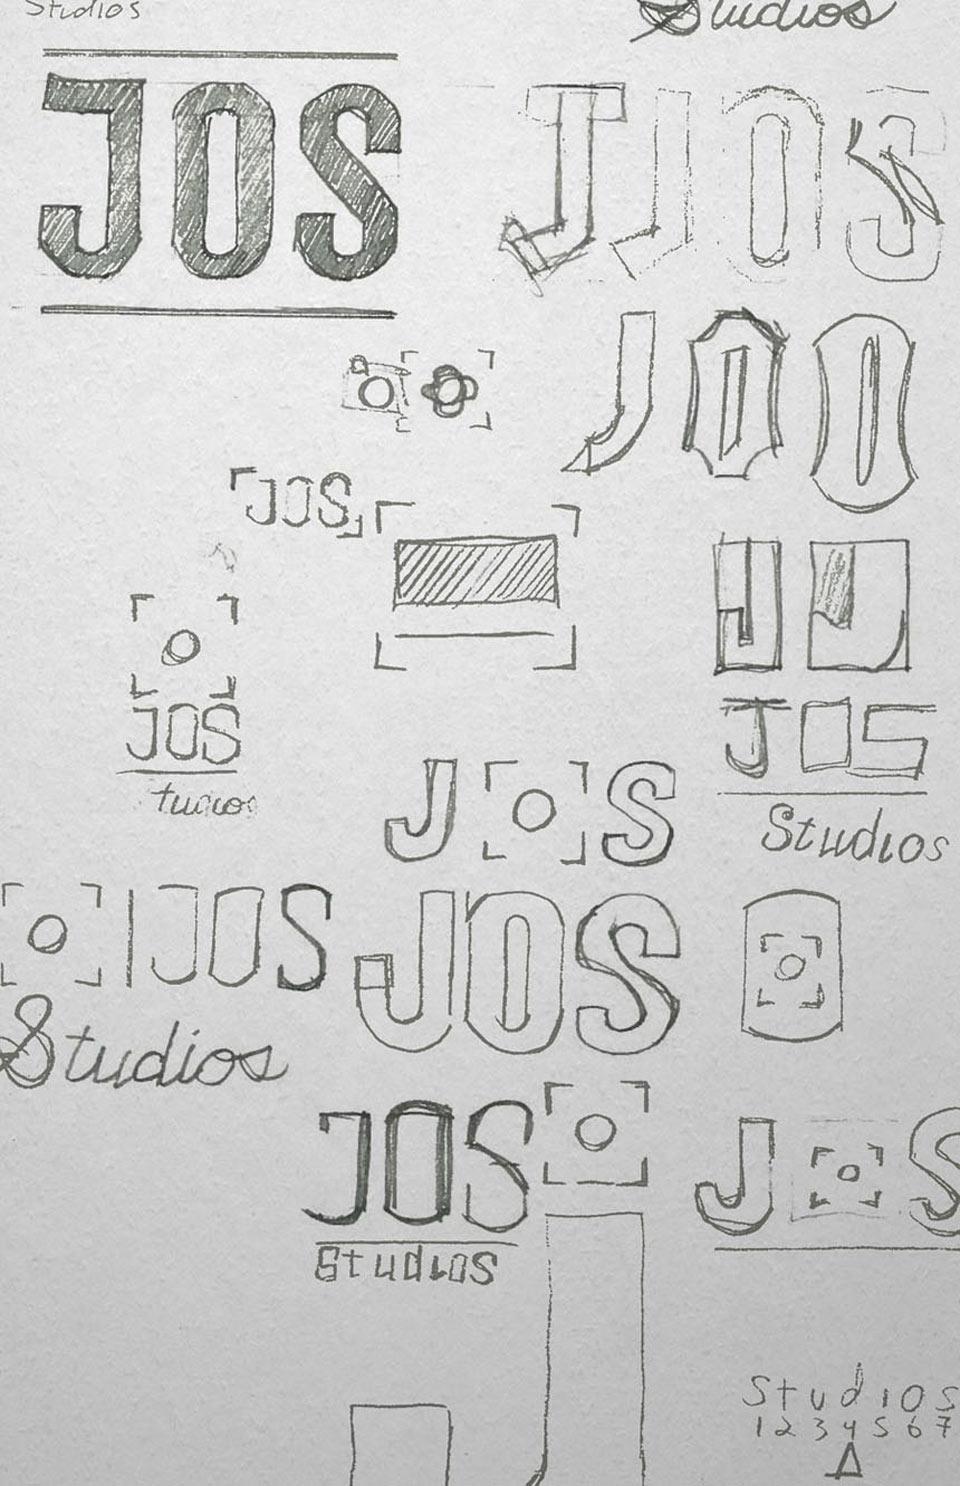 JOS Studios